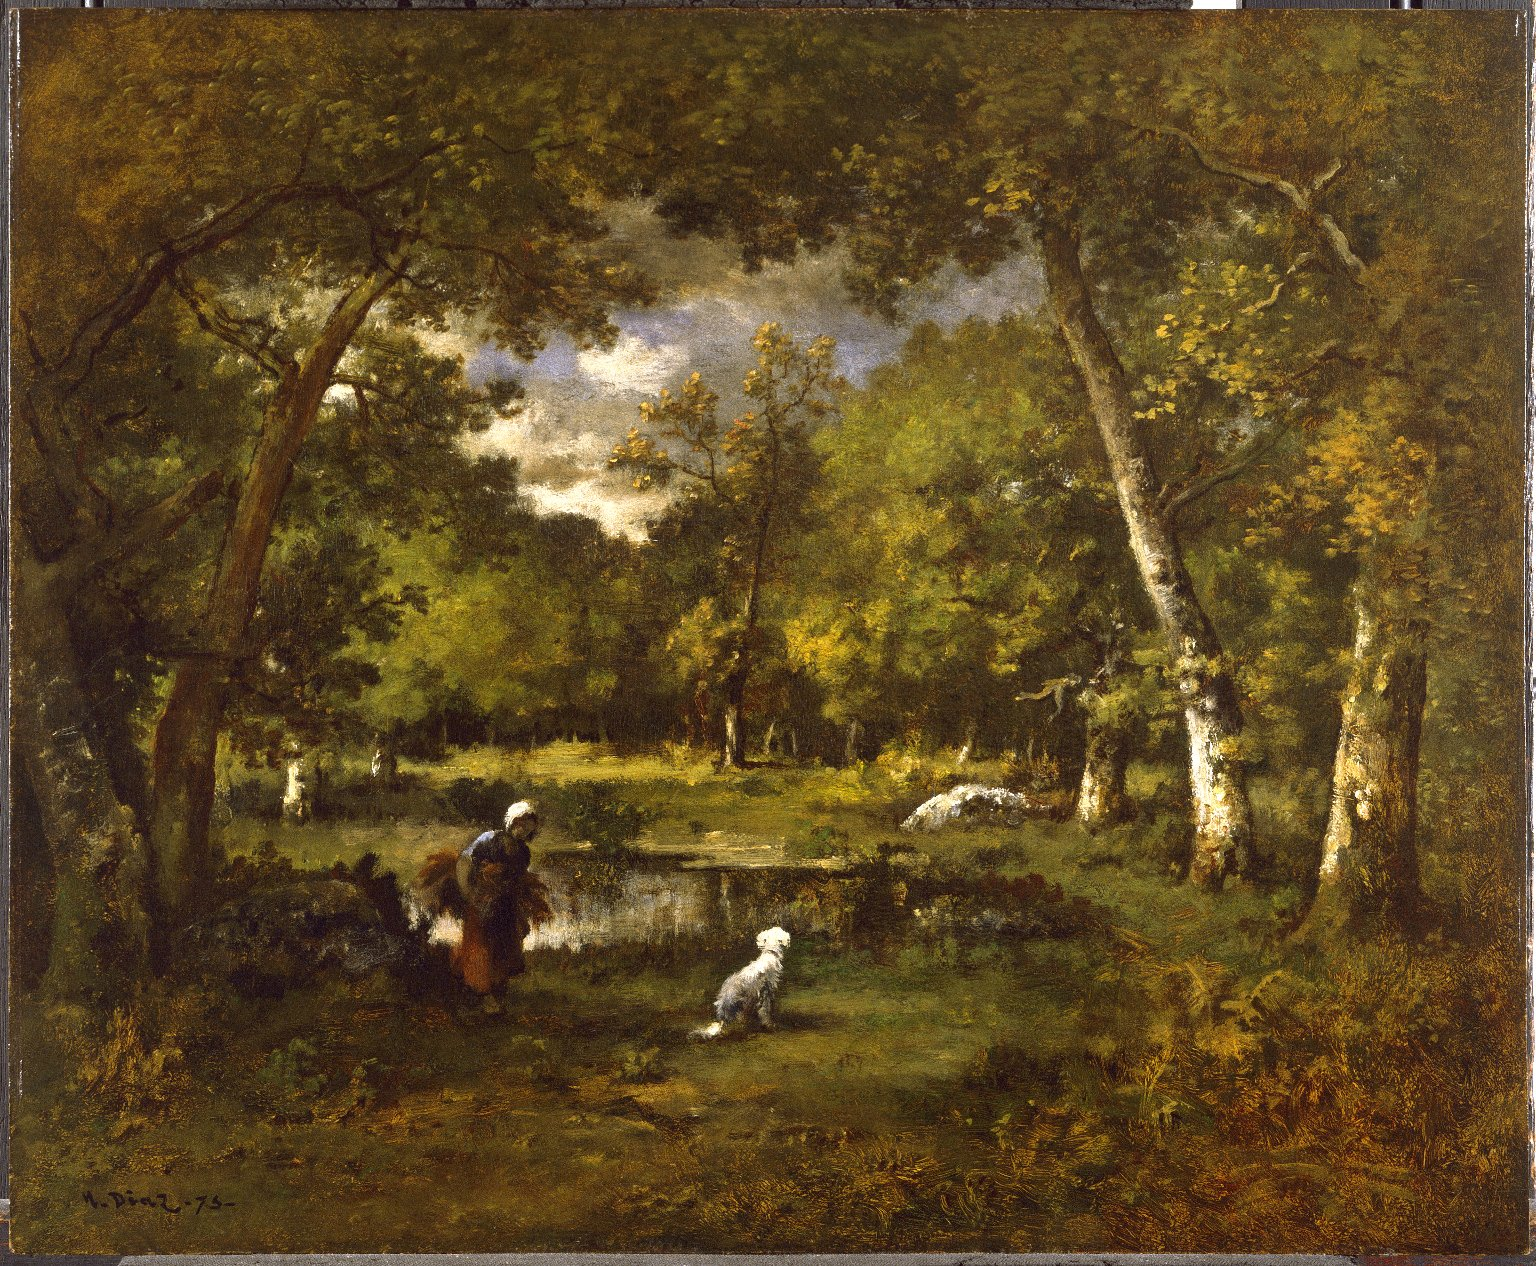 Narcisse Díaz de la Peña, Stagno a Fontainebleau (1875; olio su tavola, 45,4 x 55,7 cm; New York, Brooklyn Museum